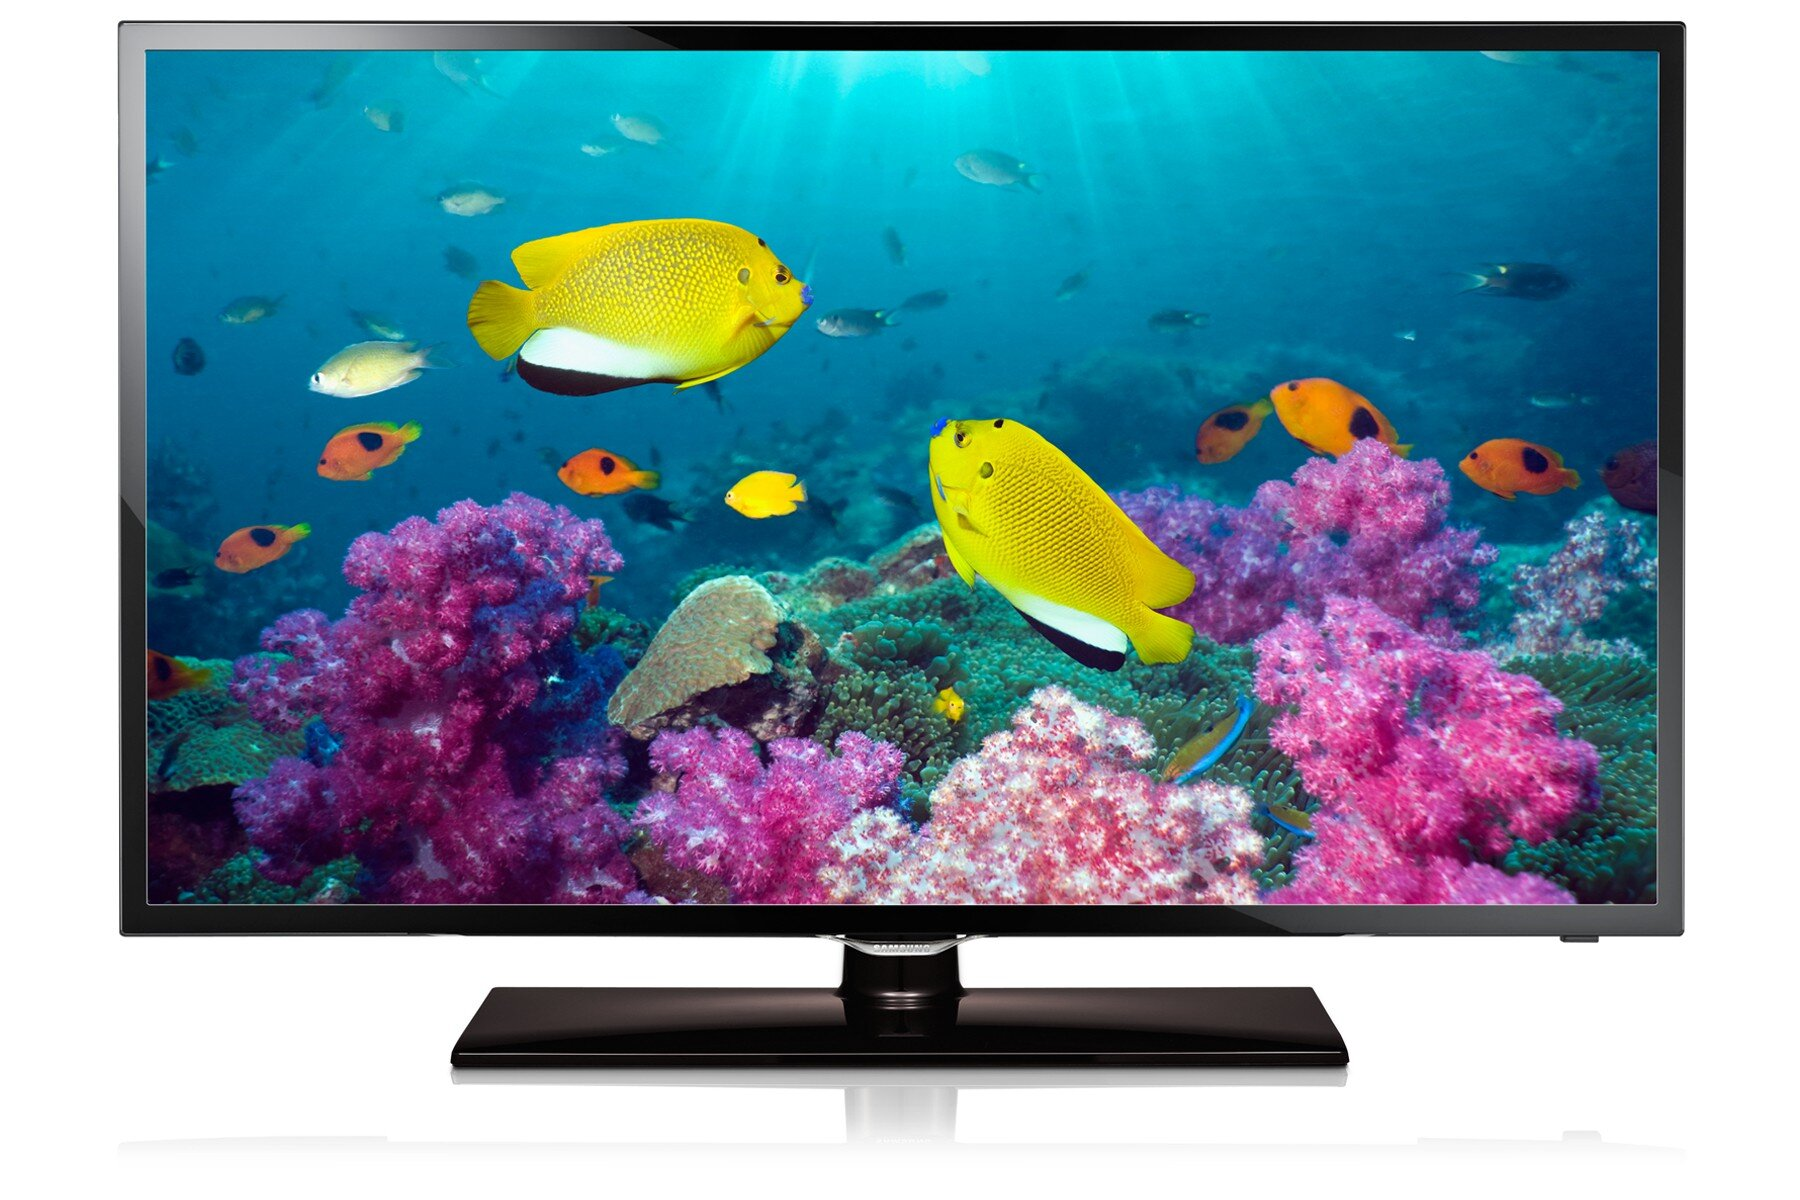 Đánh giá tivi Tivi LED Samsung UA40F5100